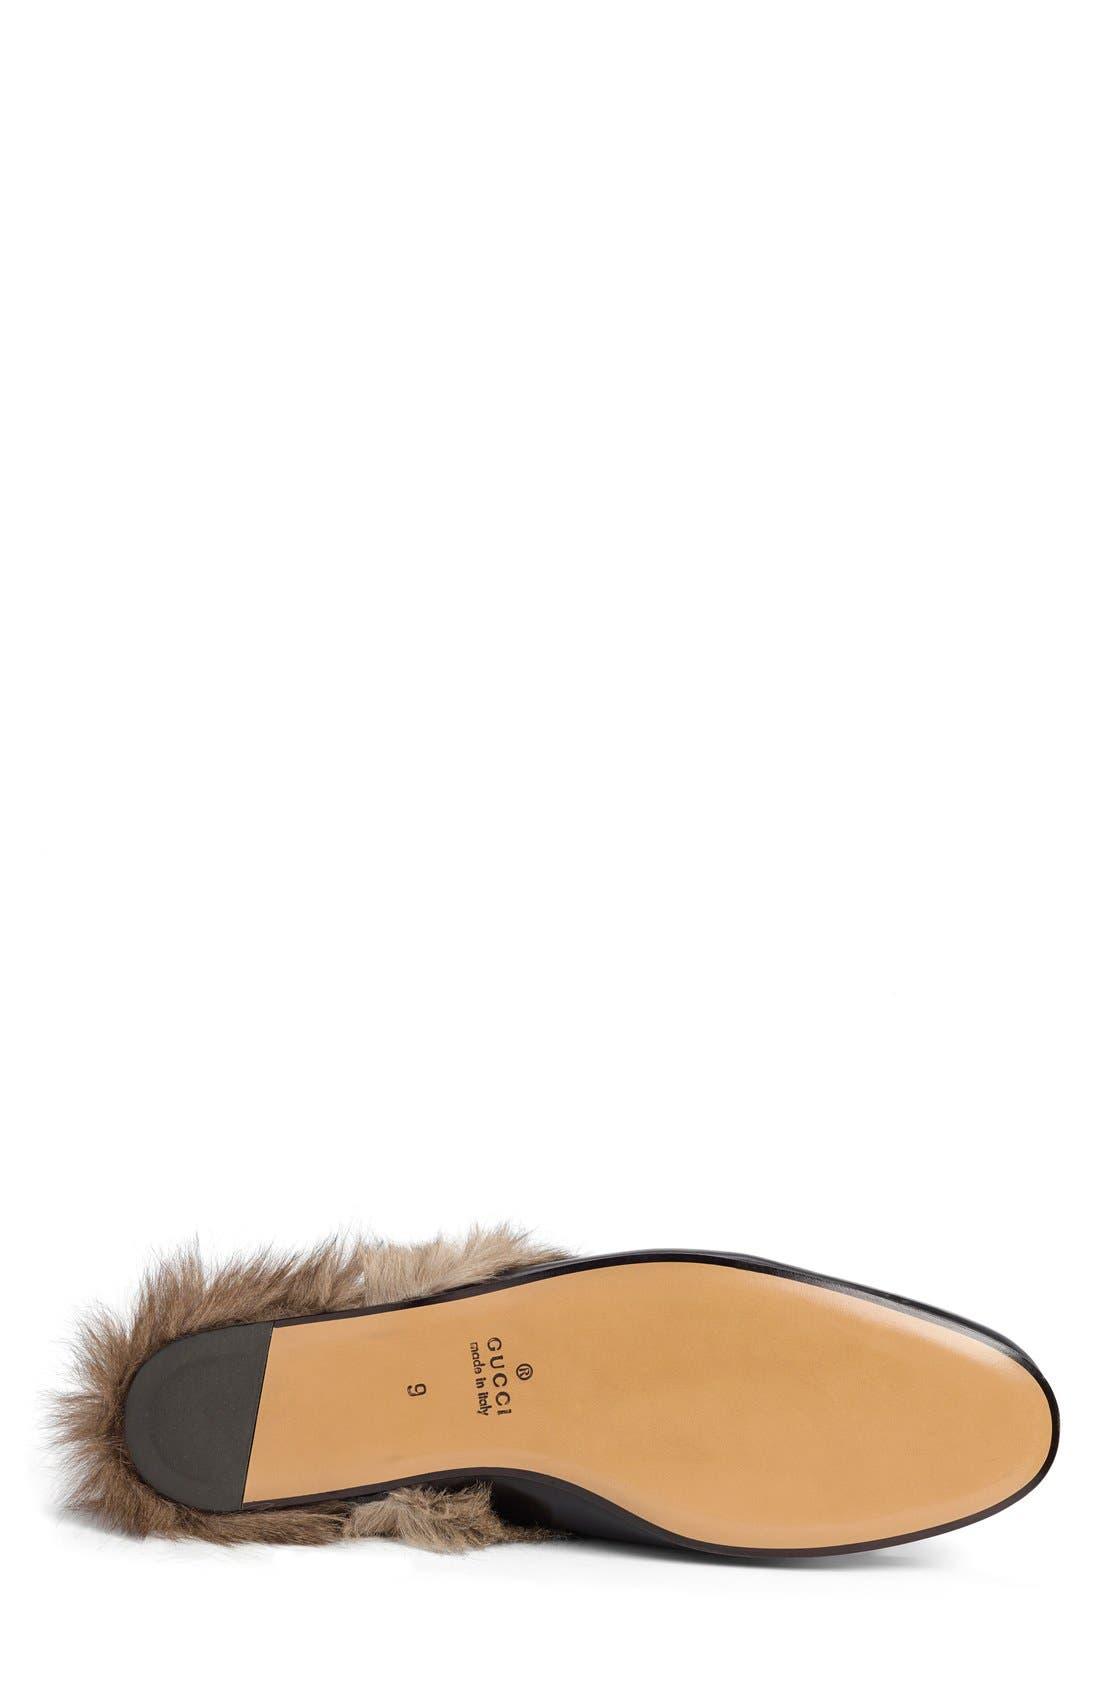 Princetown Genuine Shearling Slipper,                             Alternate thumbnail 4, color,                             BLK-TAN